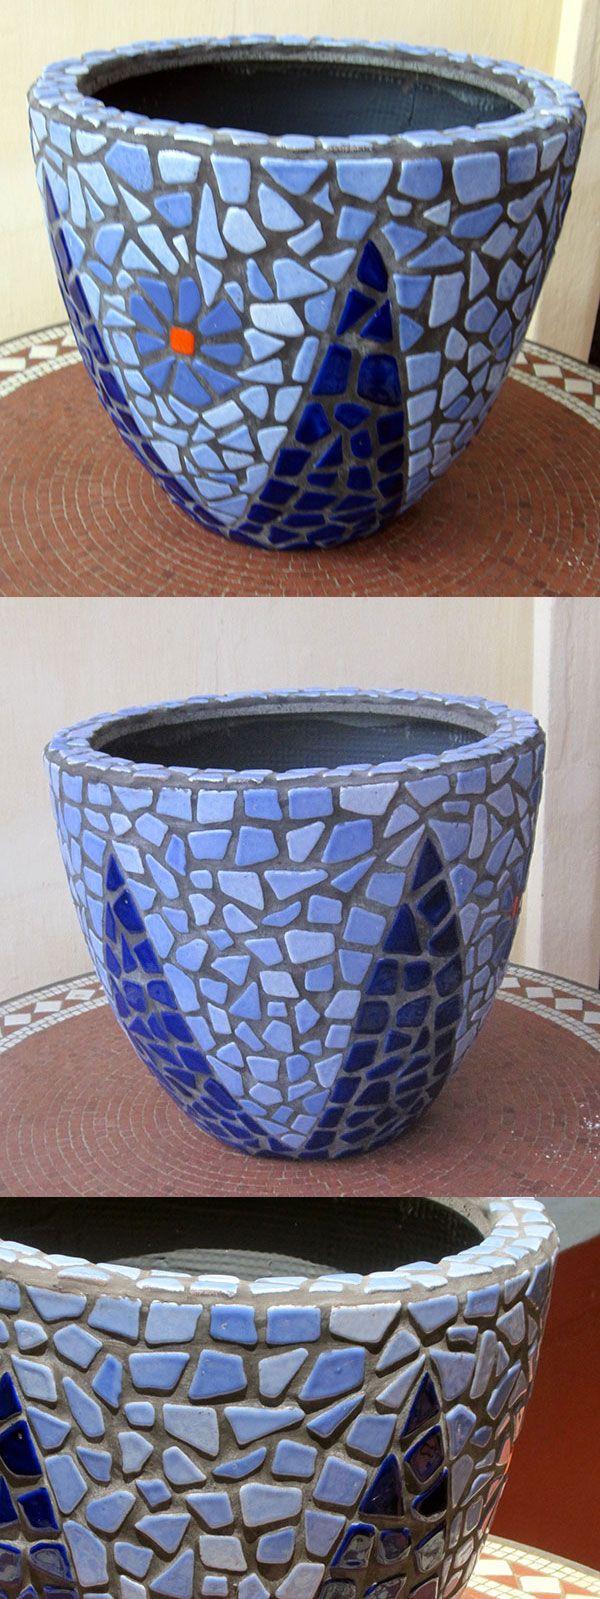 Diy mosaic blue flower pot mosaik blumentopf mosaique for Blaue blumentopfe